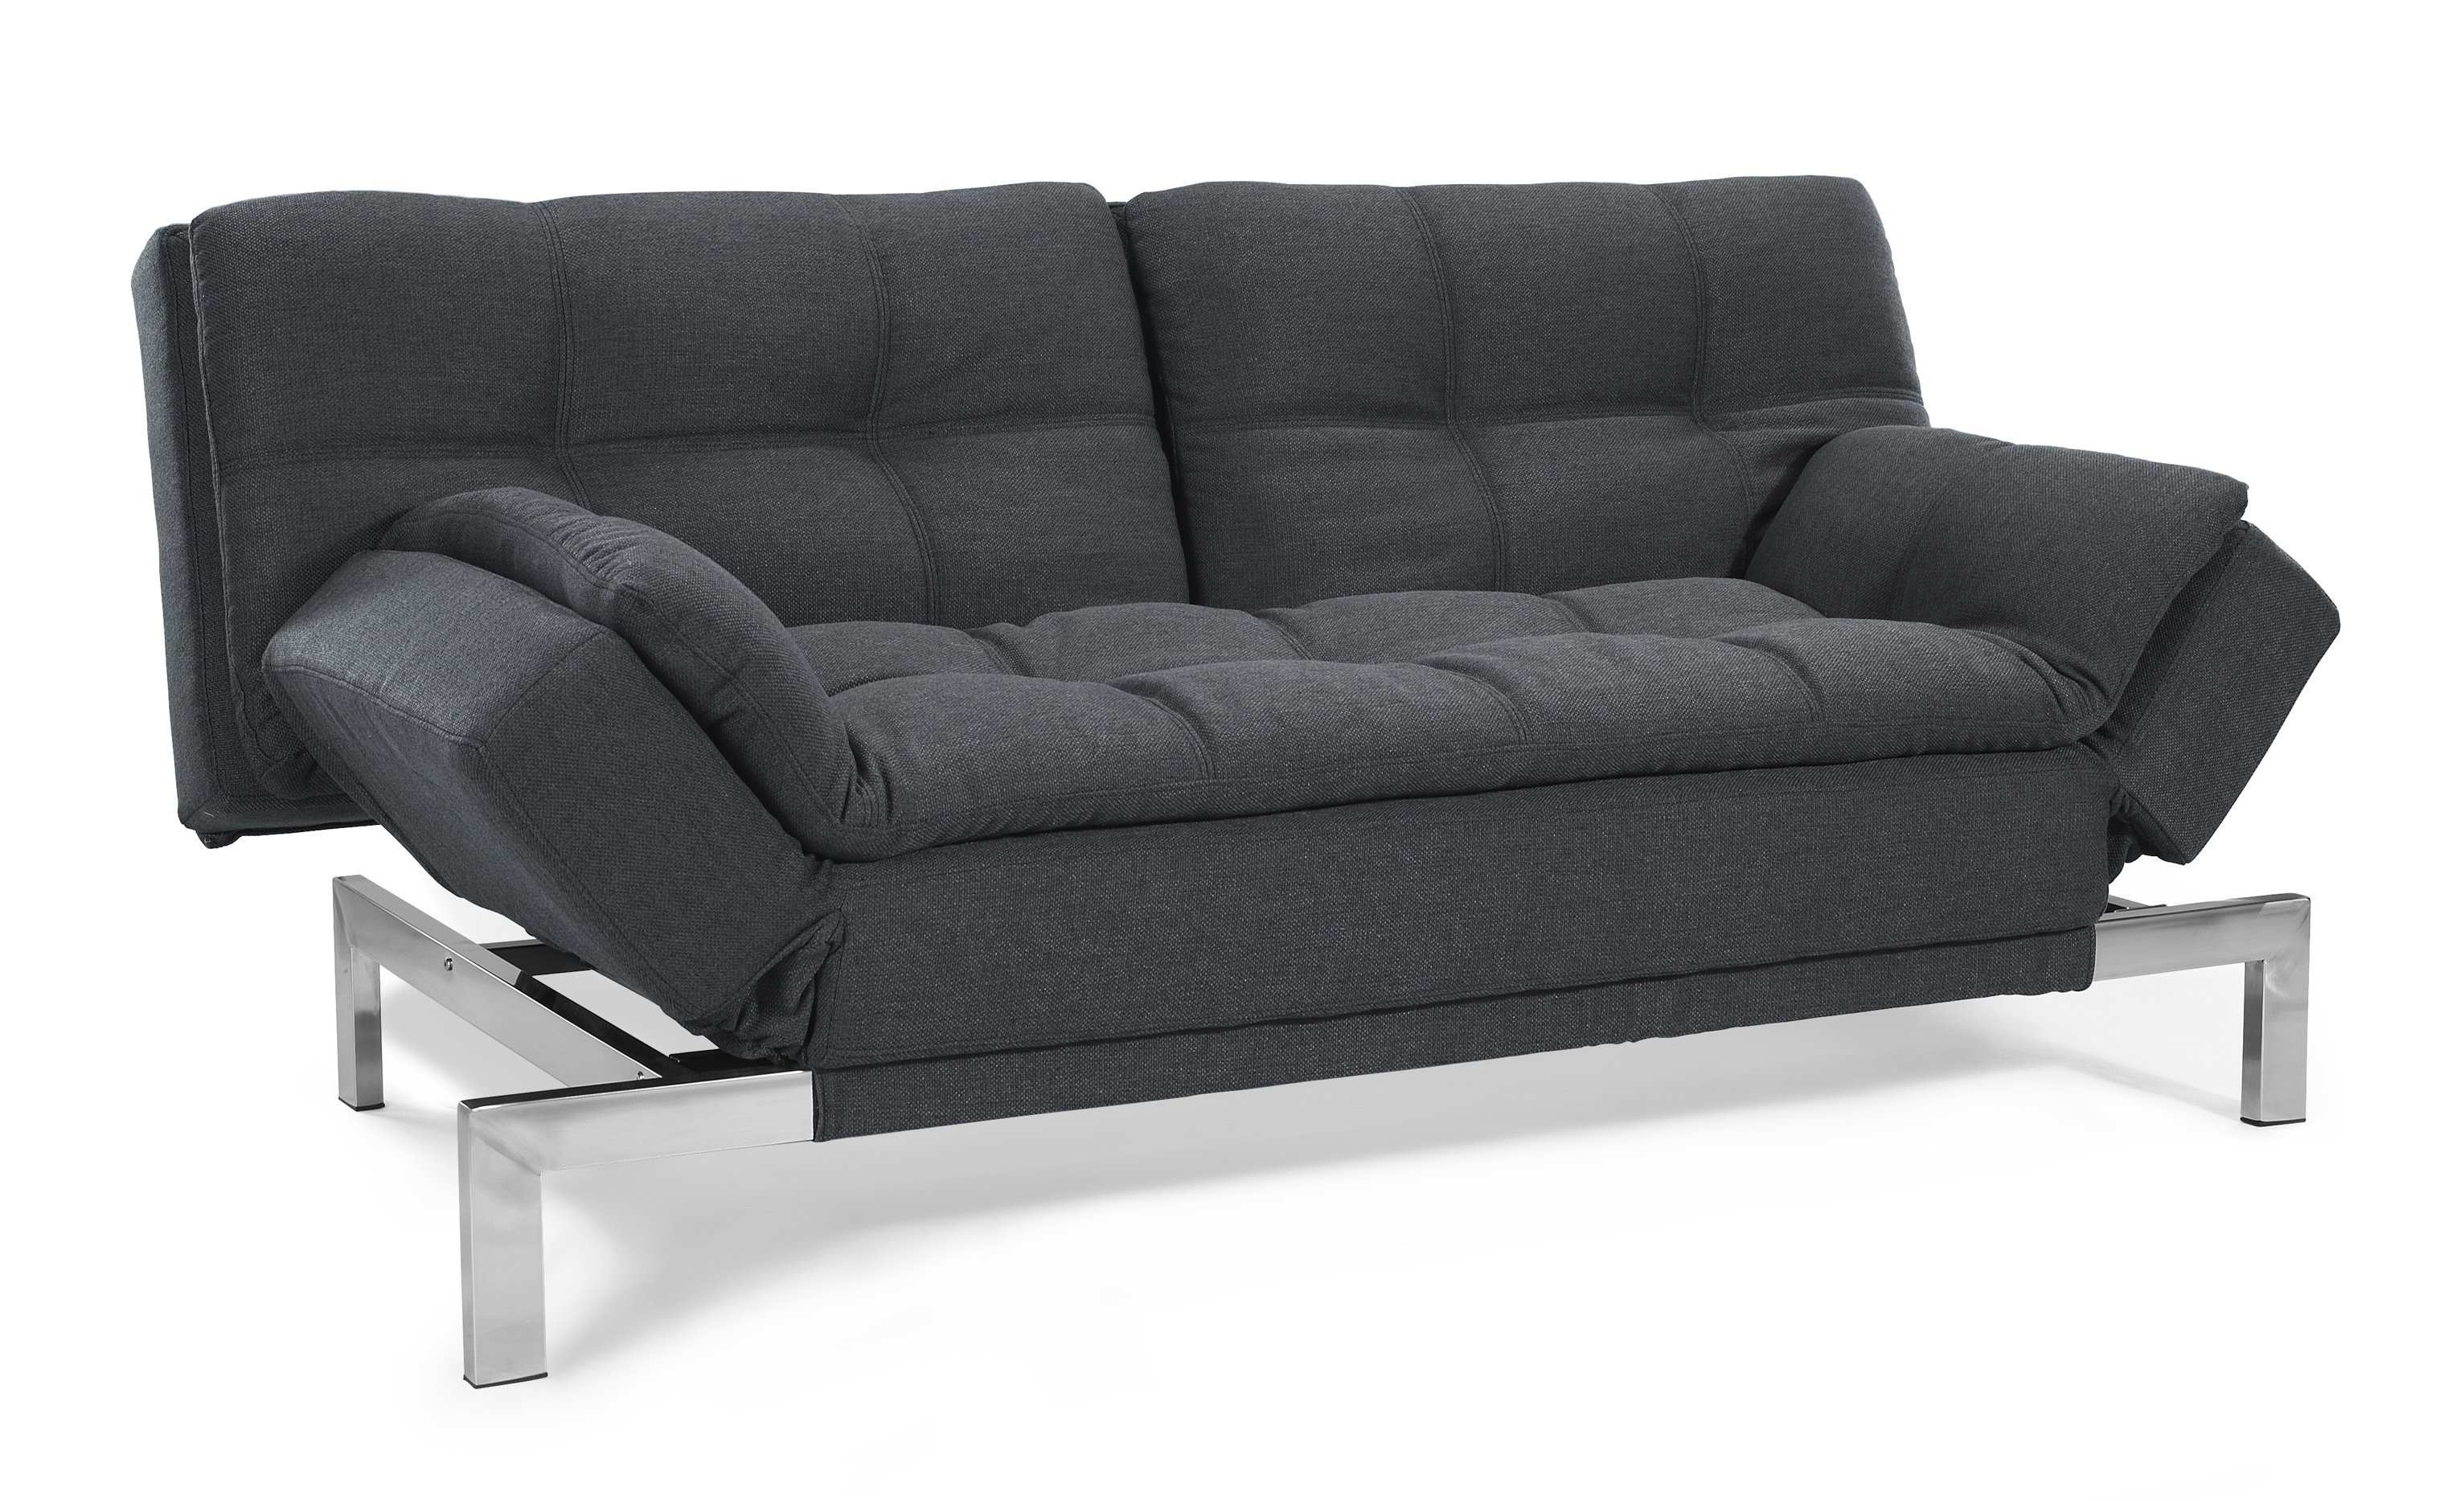 Serta Convertible Sofa  Home Furniture Design